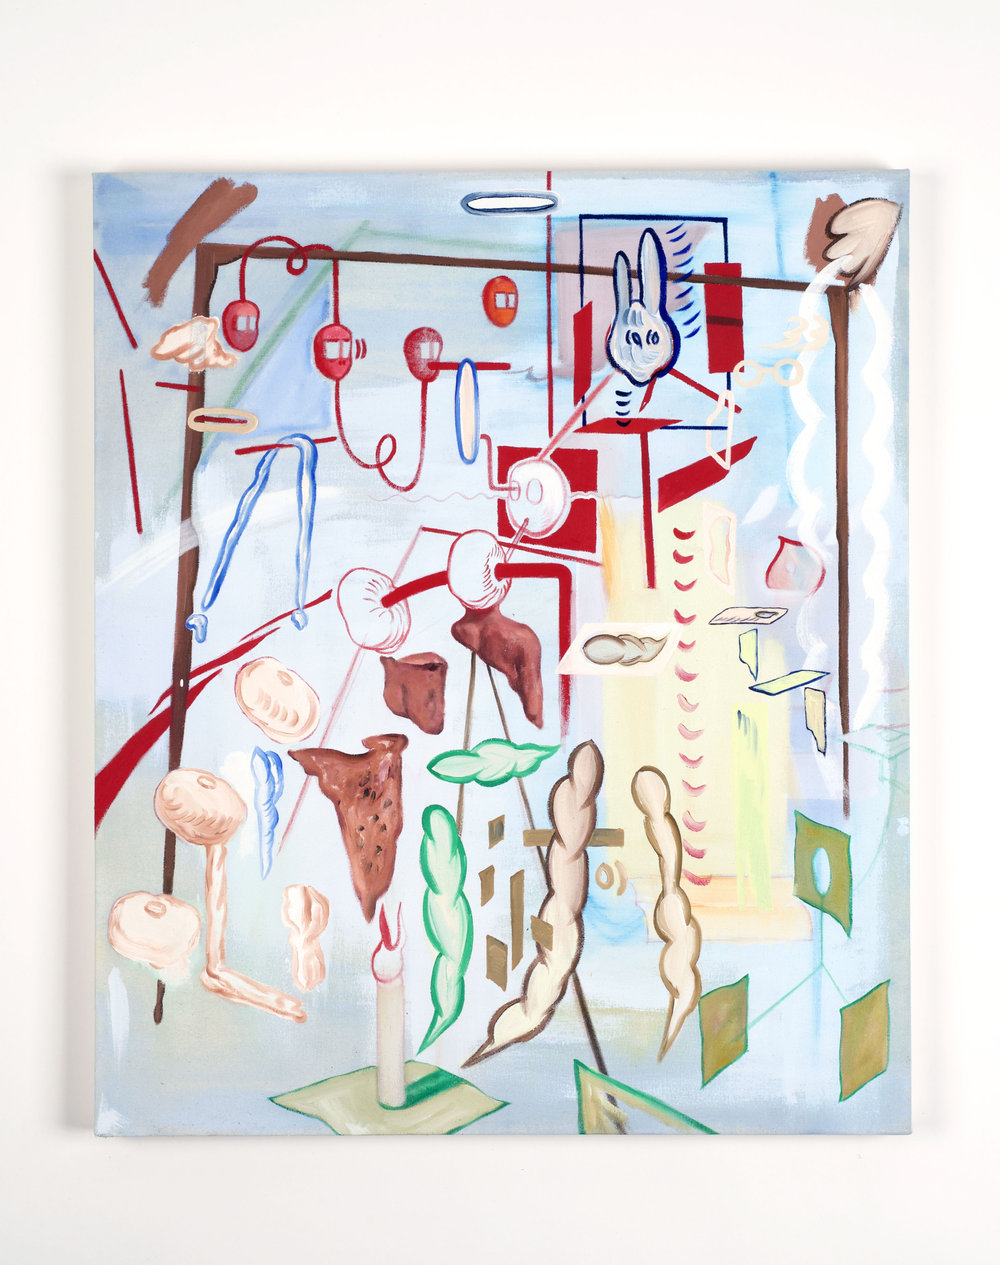 Explanatory speech    2017, Oil on canvas, 83x70cm